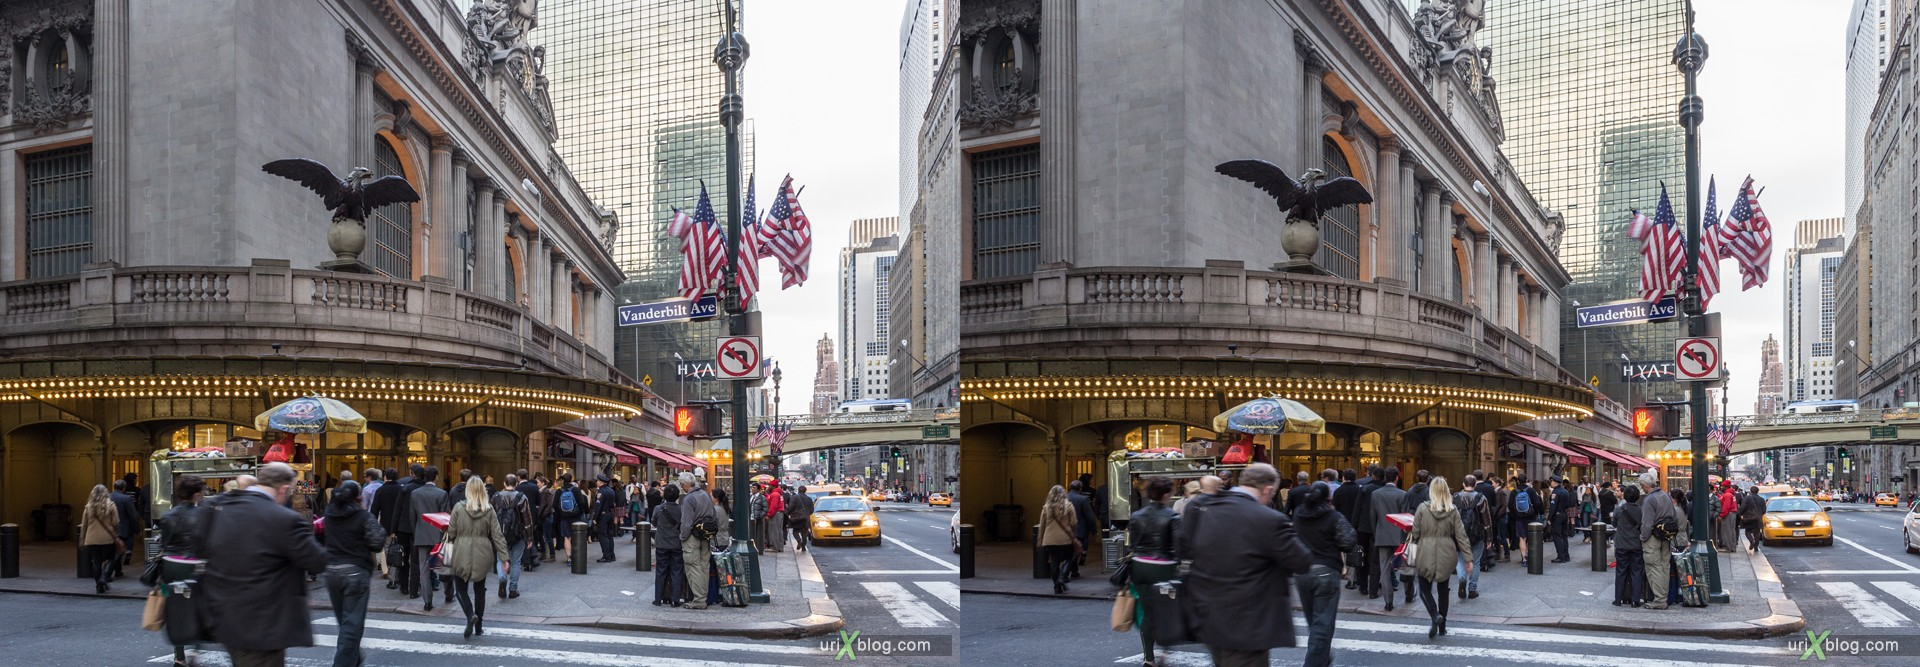 2013, Grand Central Terminal, Нью-Йорк, США, 3D, перекрёстные стереопары, стерео, стереопара, стереопары